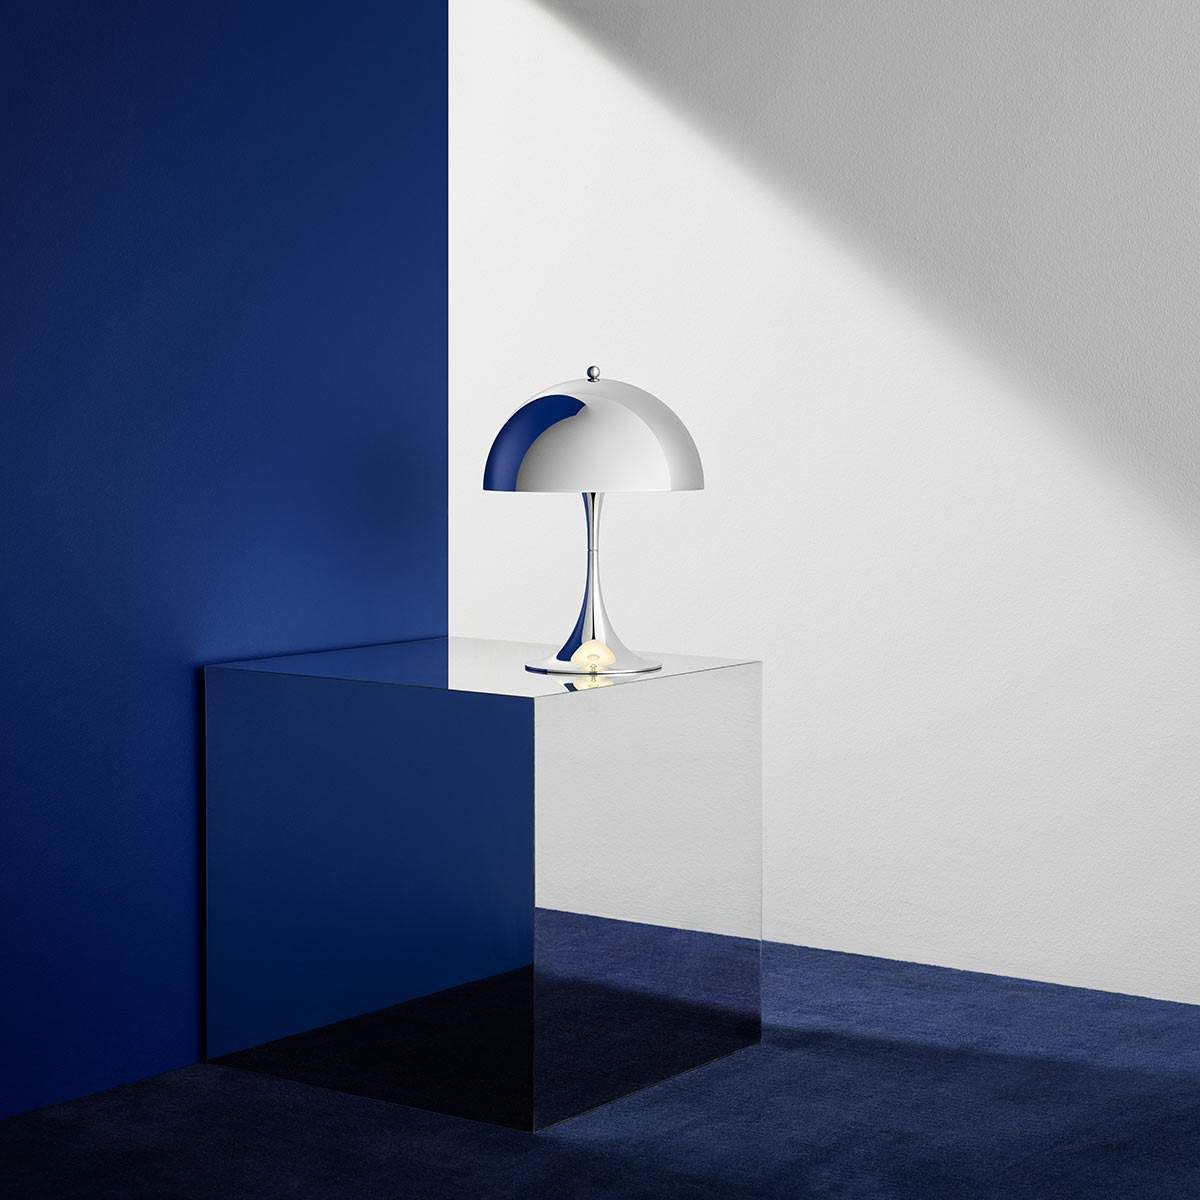 louis poulsen panthella mini lampe led chrom lampe. Black Bedroom Furniture Sets. Home Design Ideas